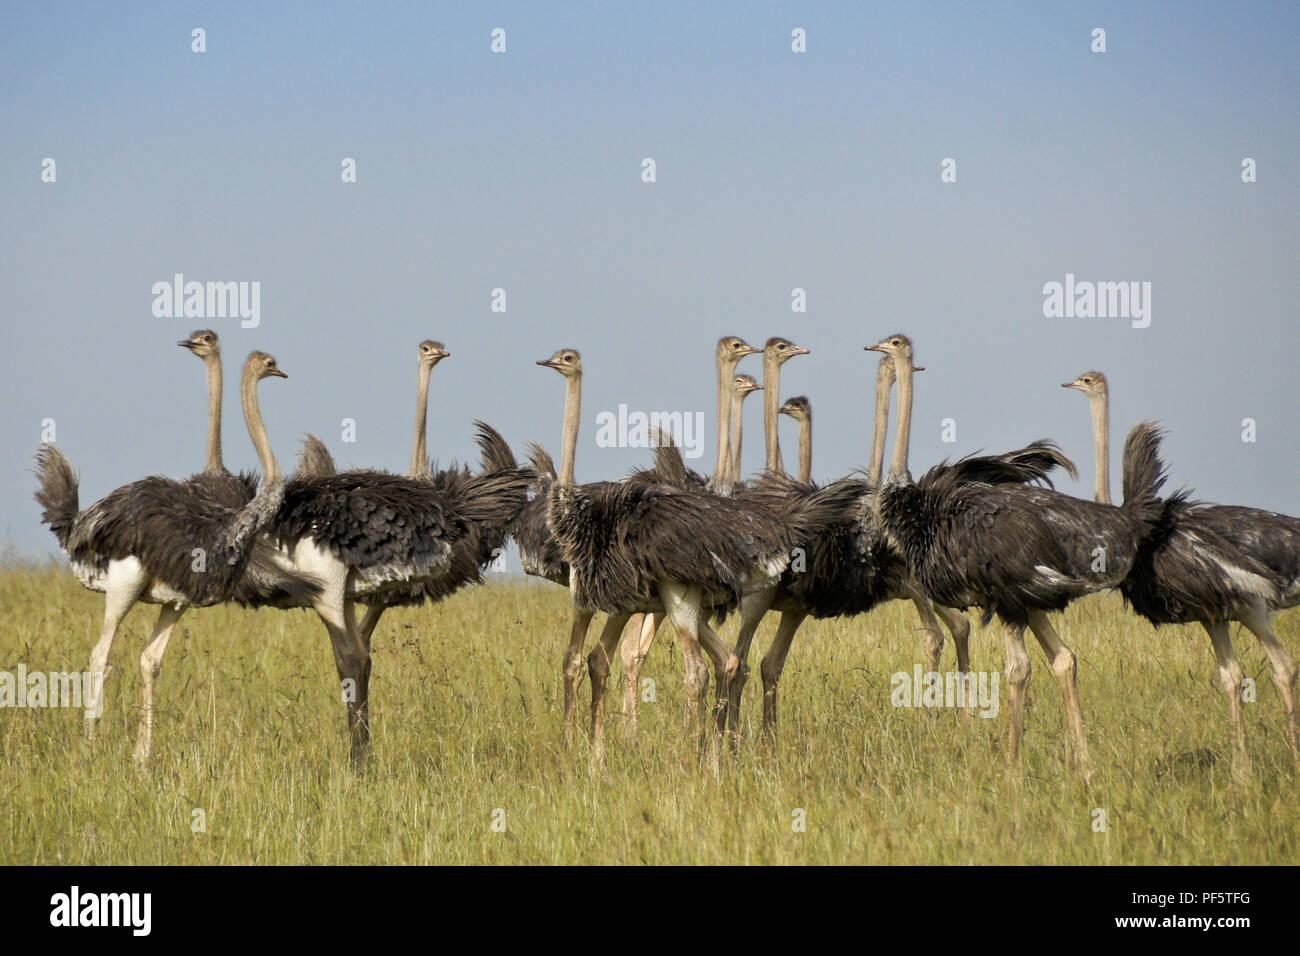 Flock of juvenile Masai ostriches, Masai Mara Game Reserve, Kenya - Stock Image